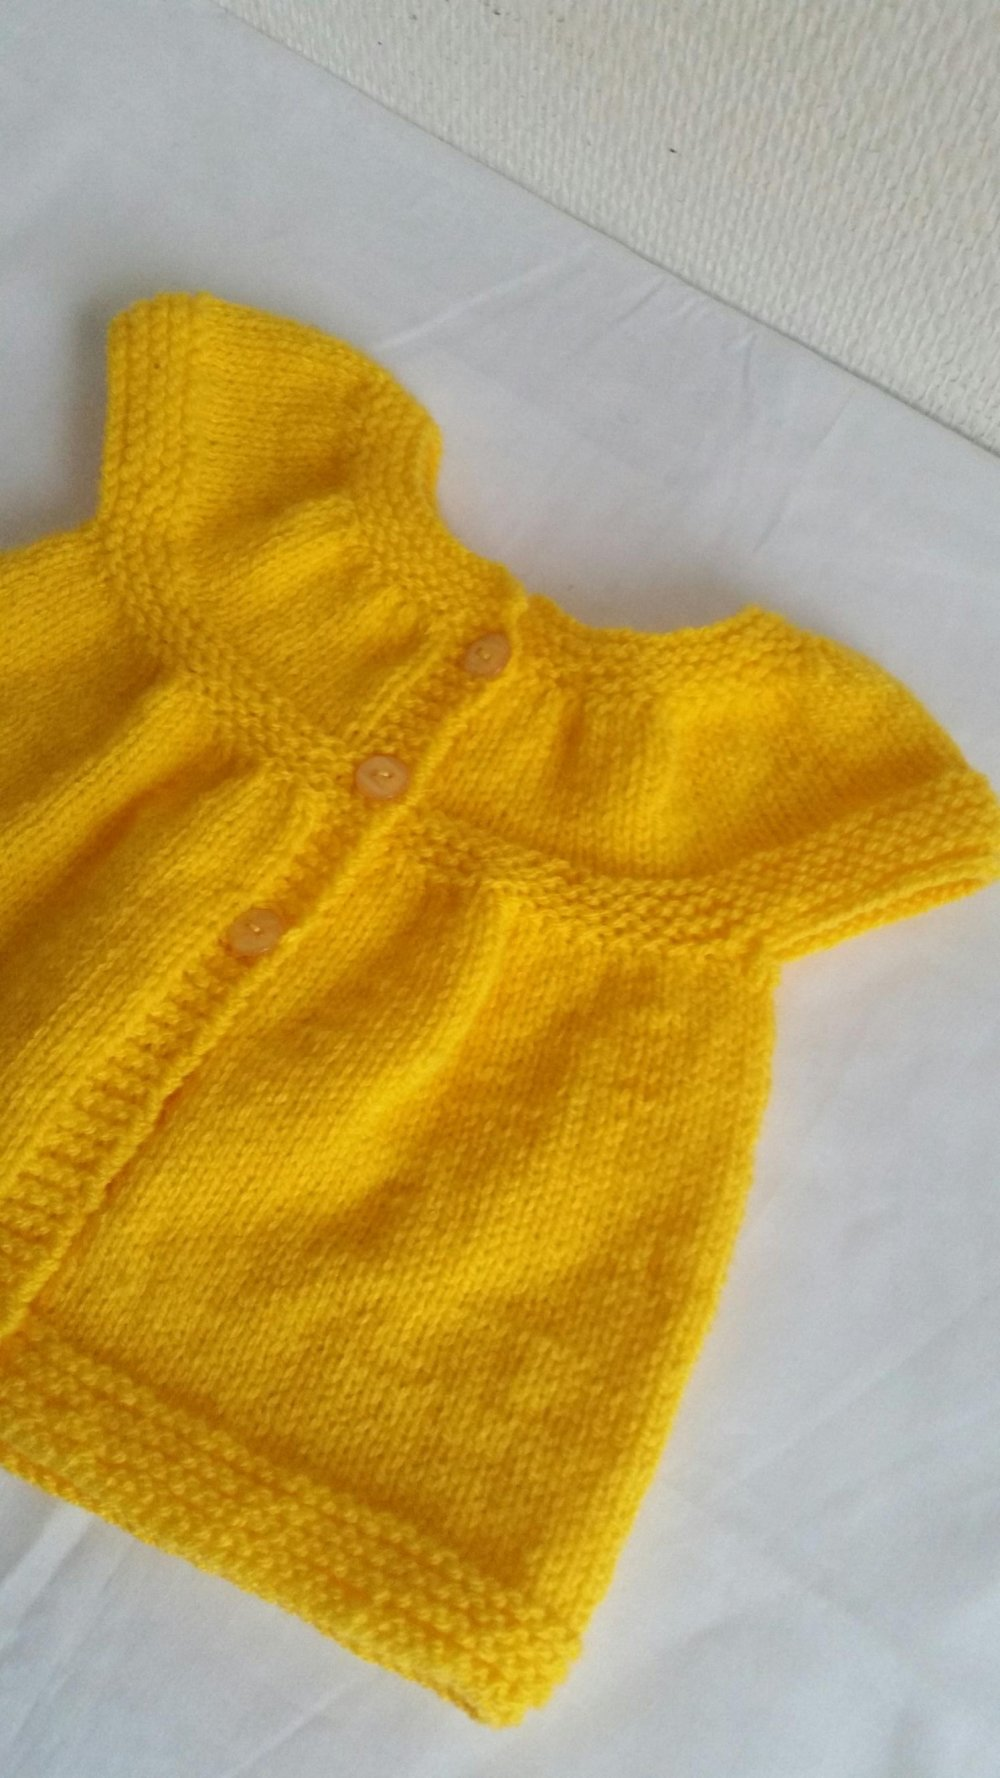 Robe boléro bébé-Gilet -Cardigan-Chauffe épaules-cadeau